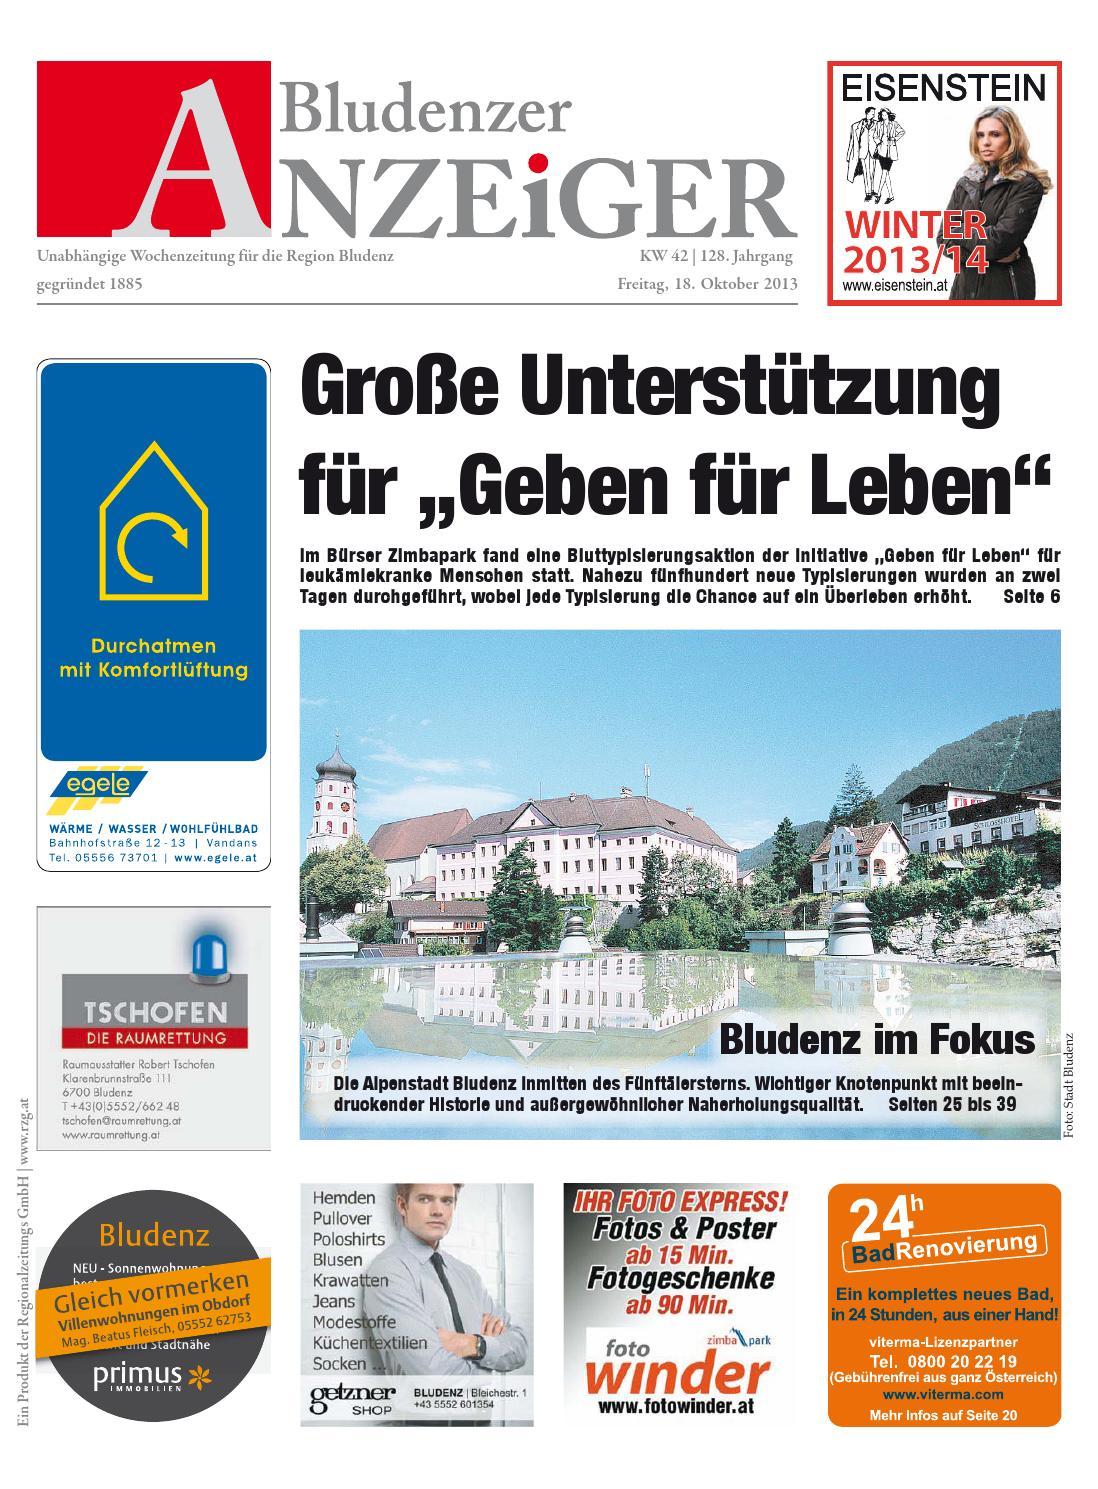 Singles in Bludenz, 100% kostenlose Singlebrse | austria